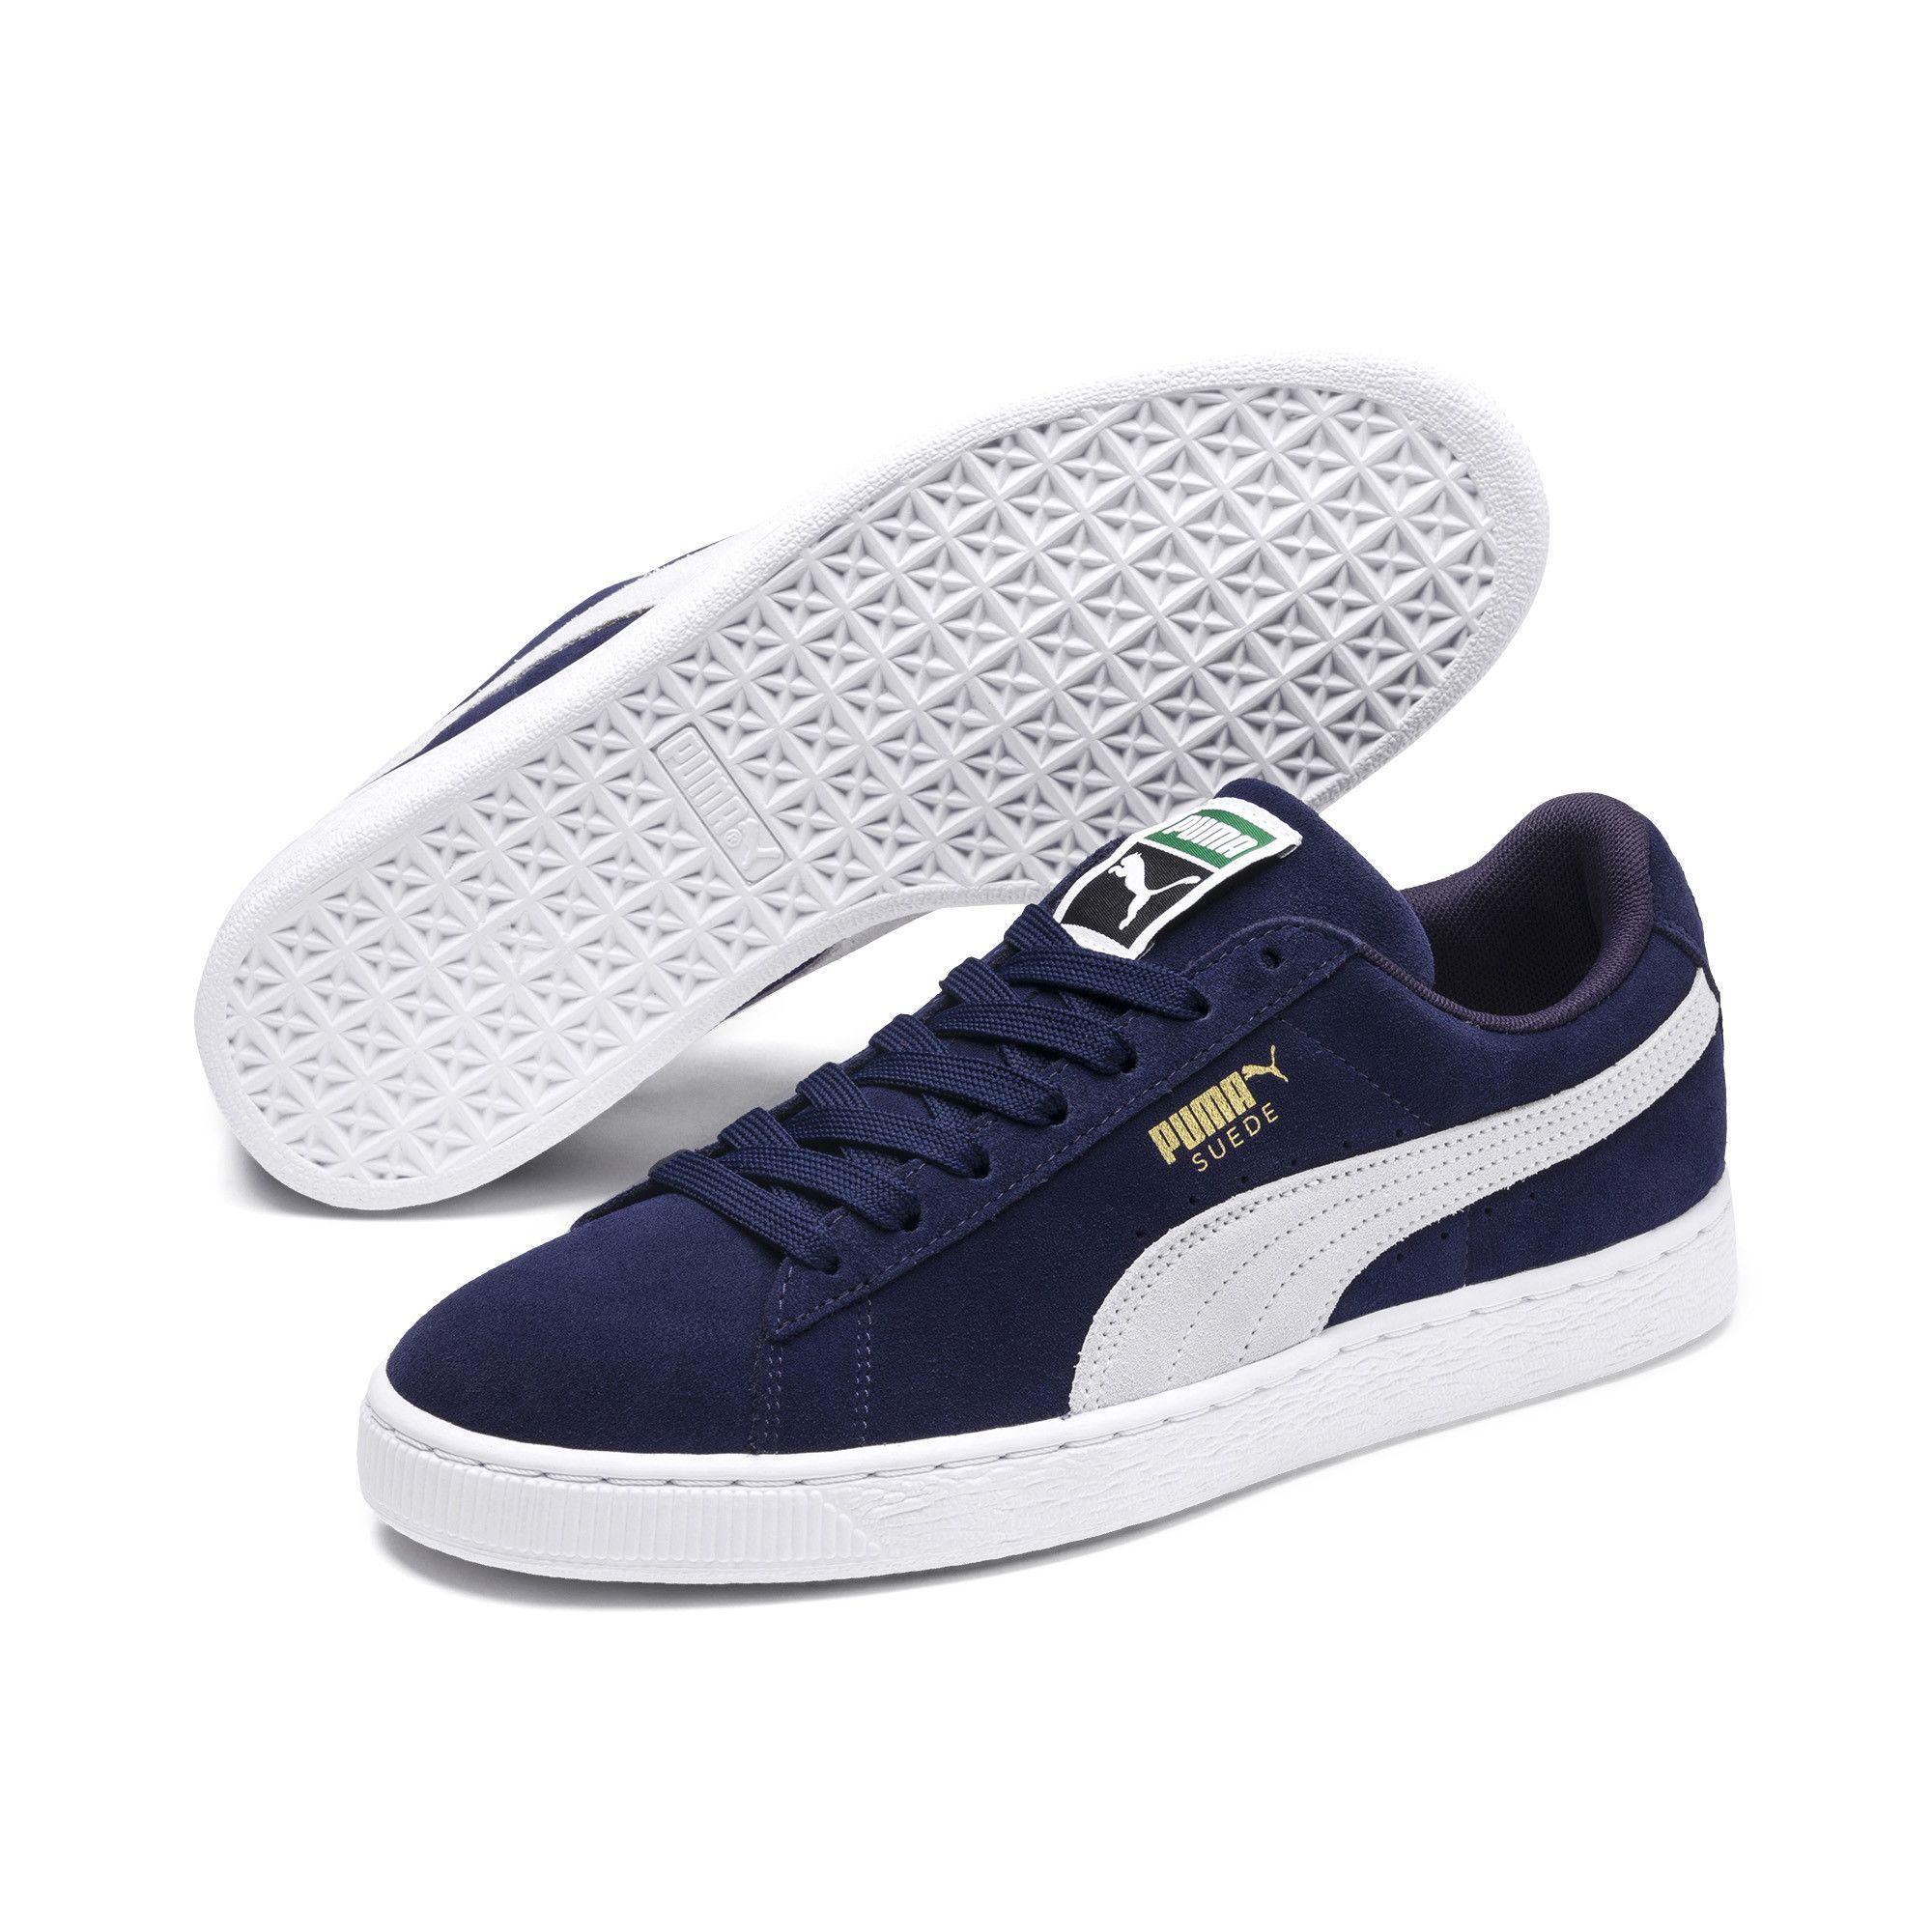 Puma shoes women, Puma sneakers suede